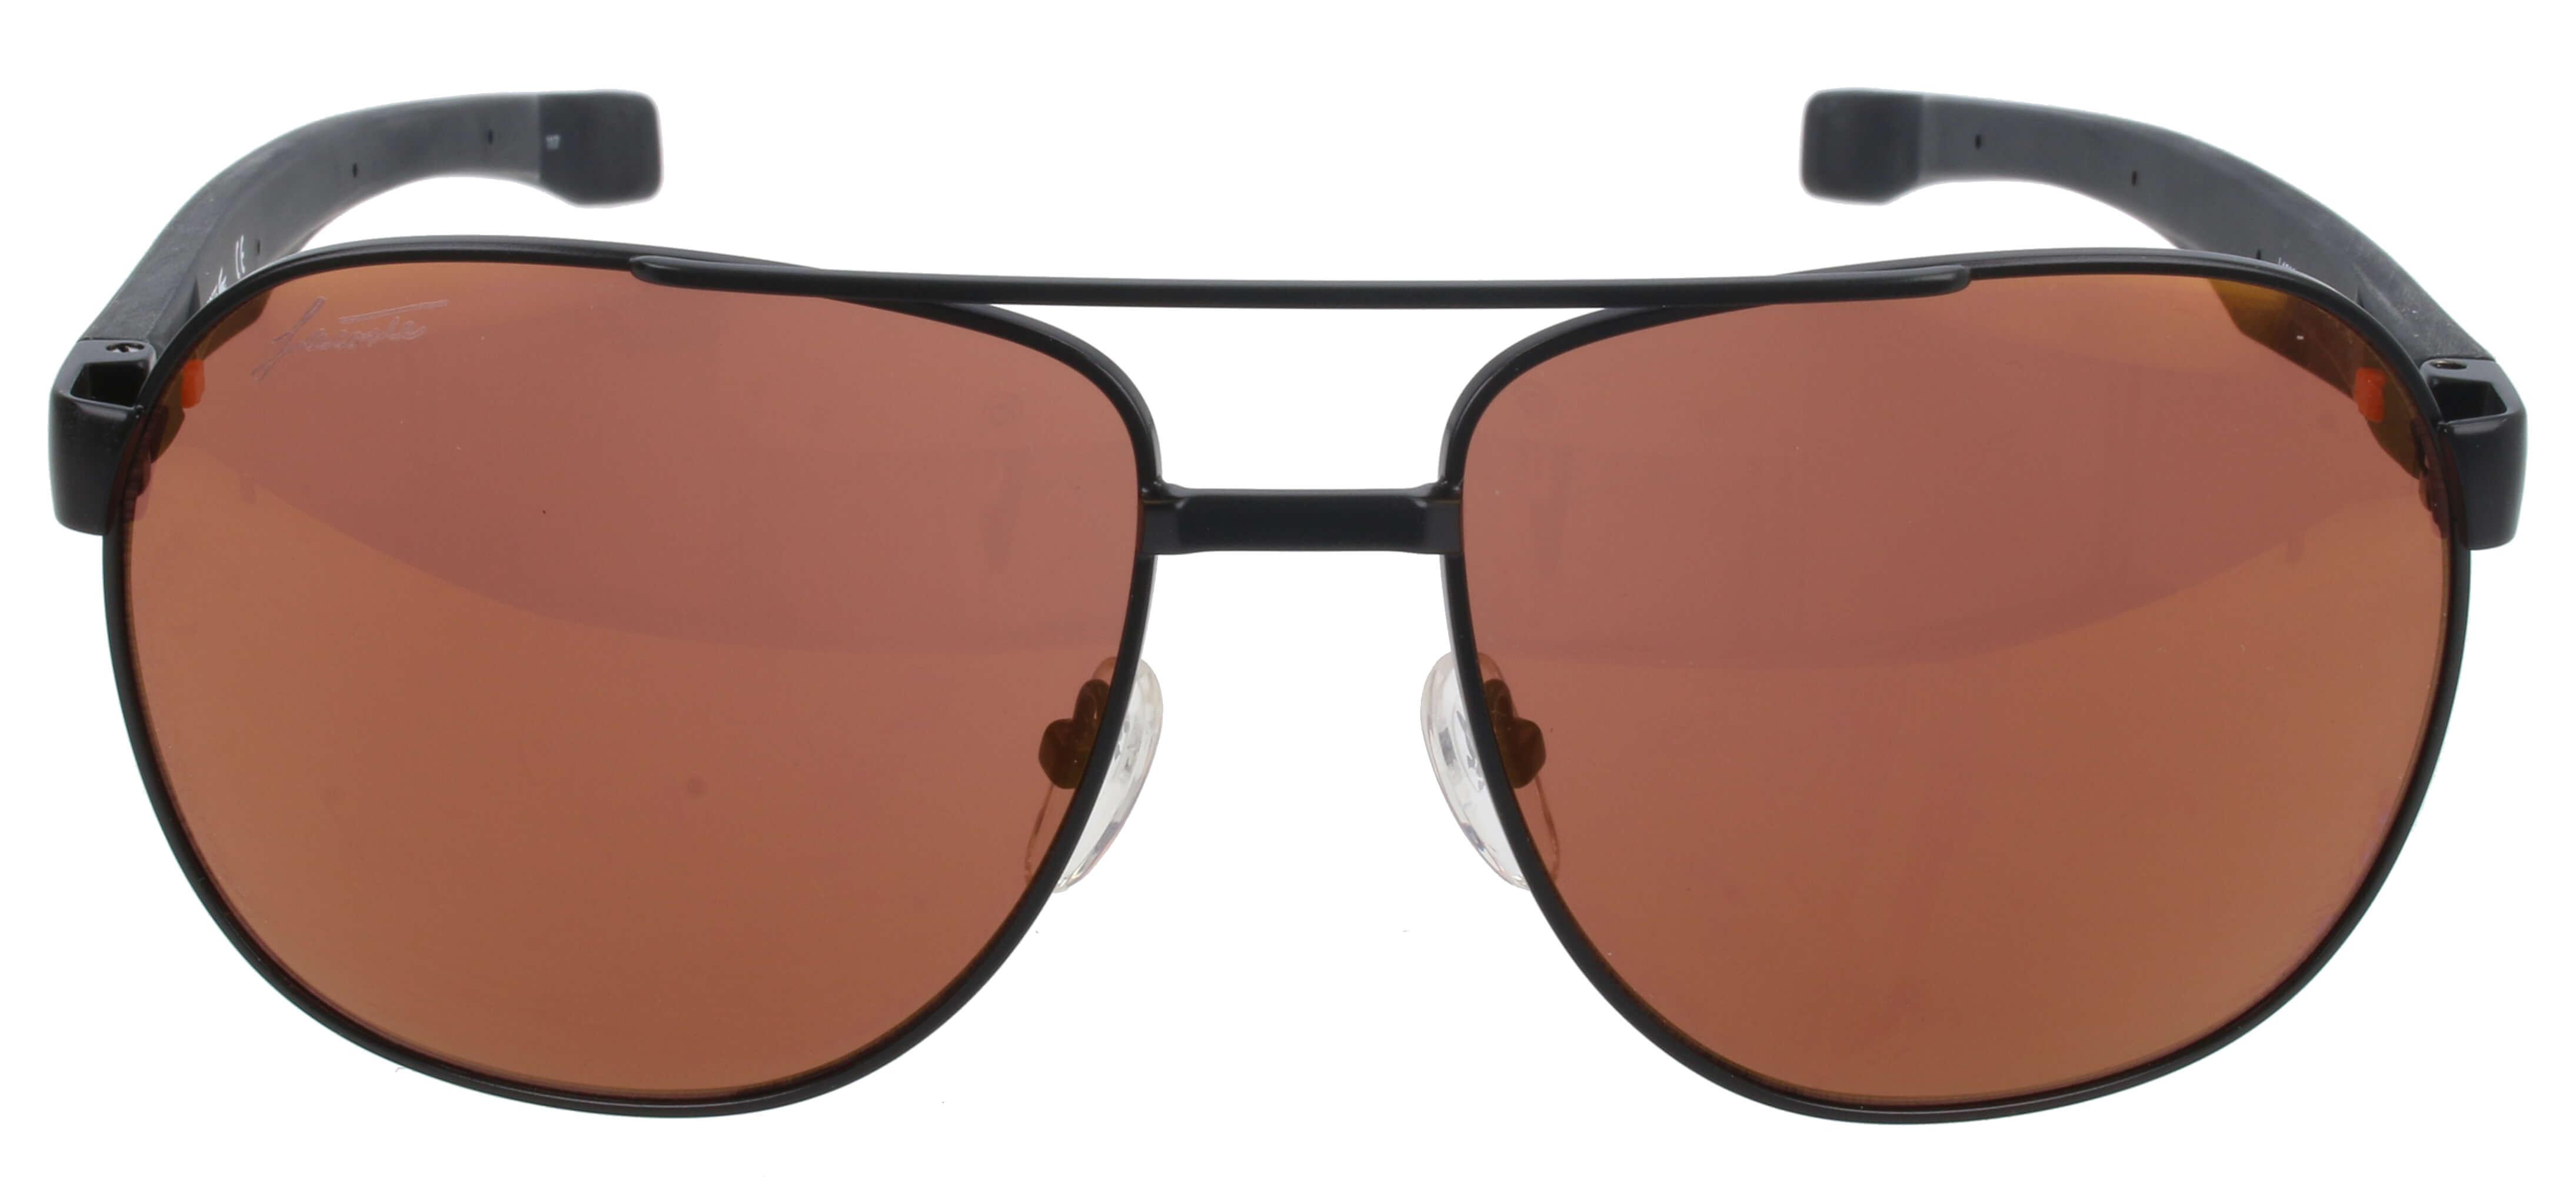 Lacoste Slnečné okuliare L186S 32940 001 Doprava ZDARMA  6a413e60742